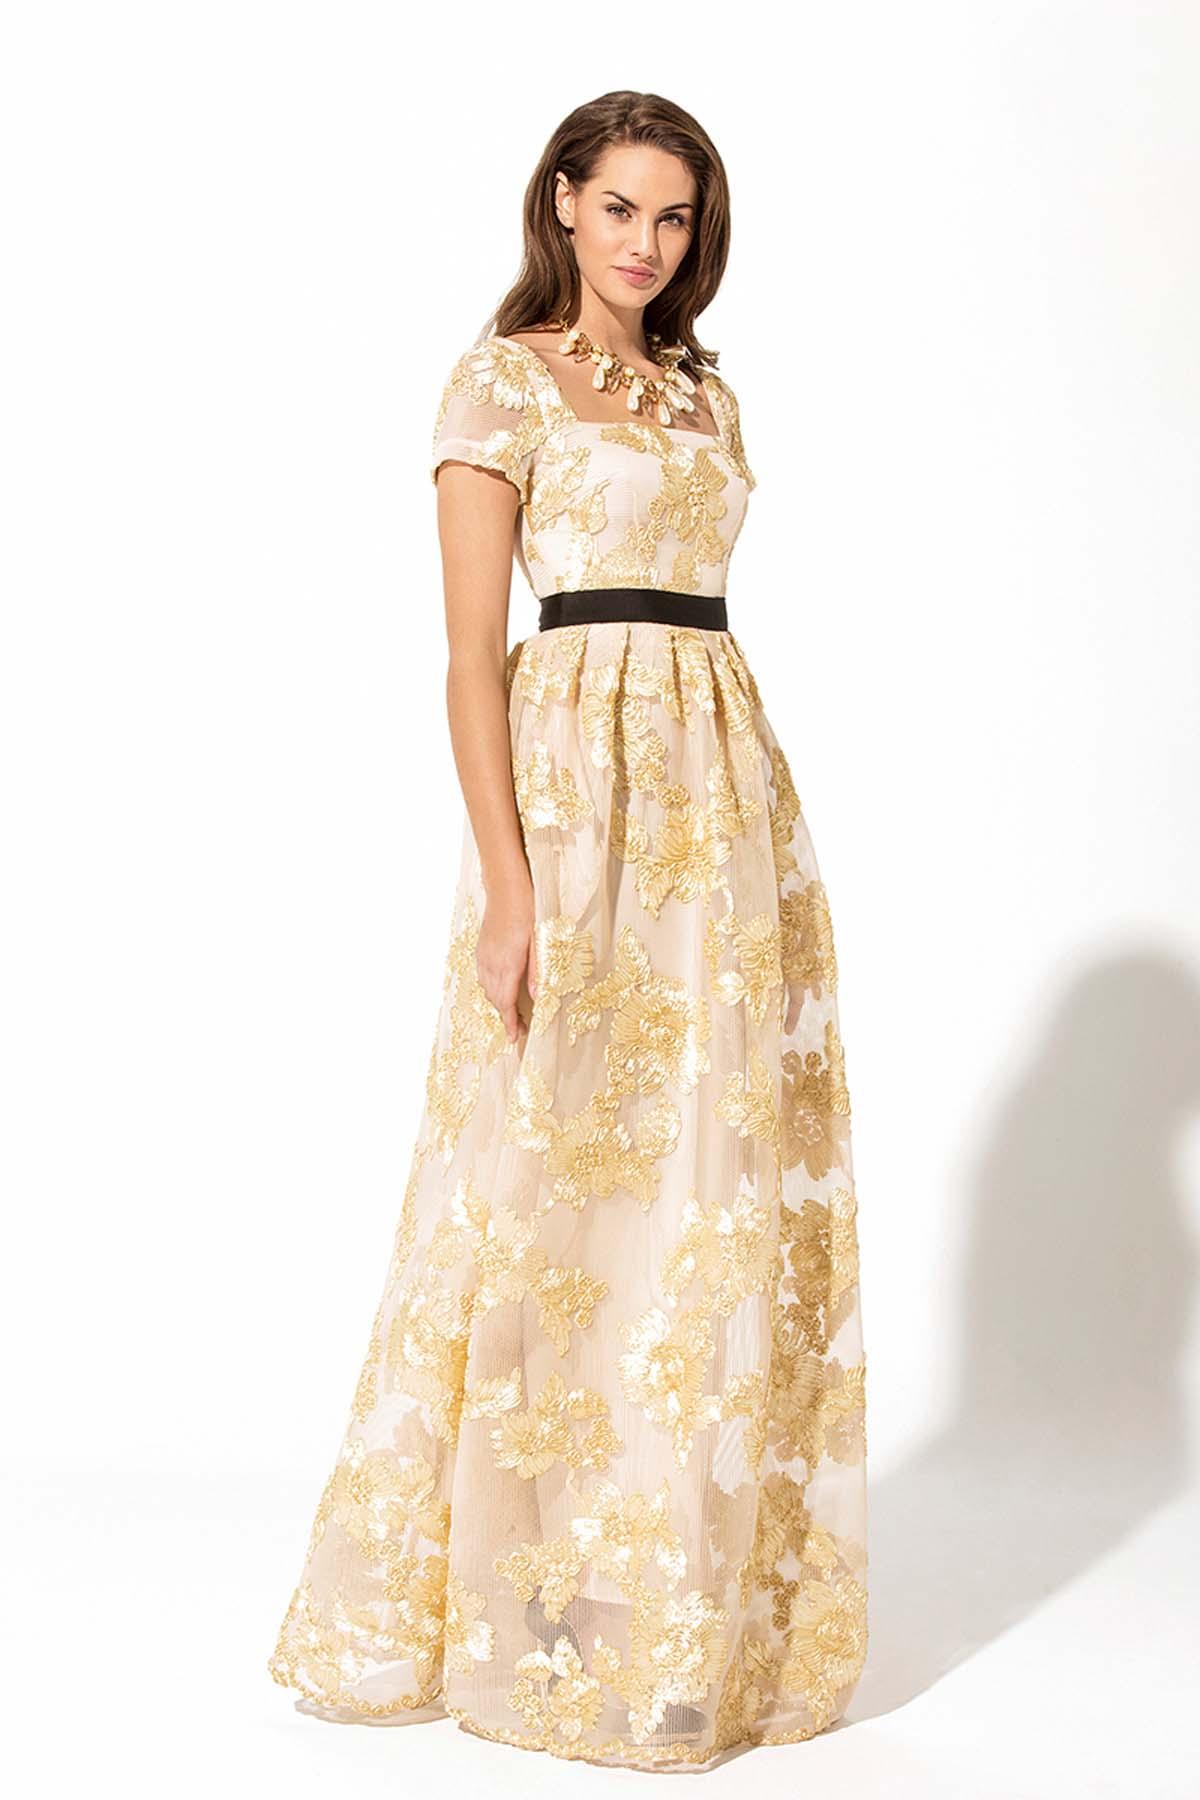 Teria Yabar - Vestido largo de flores